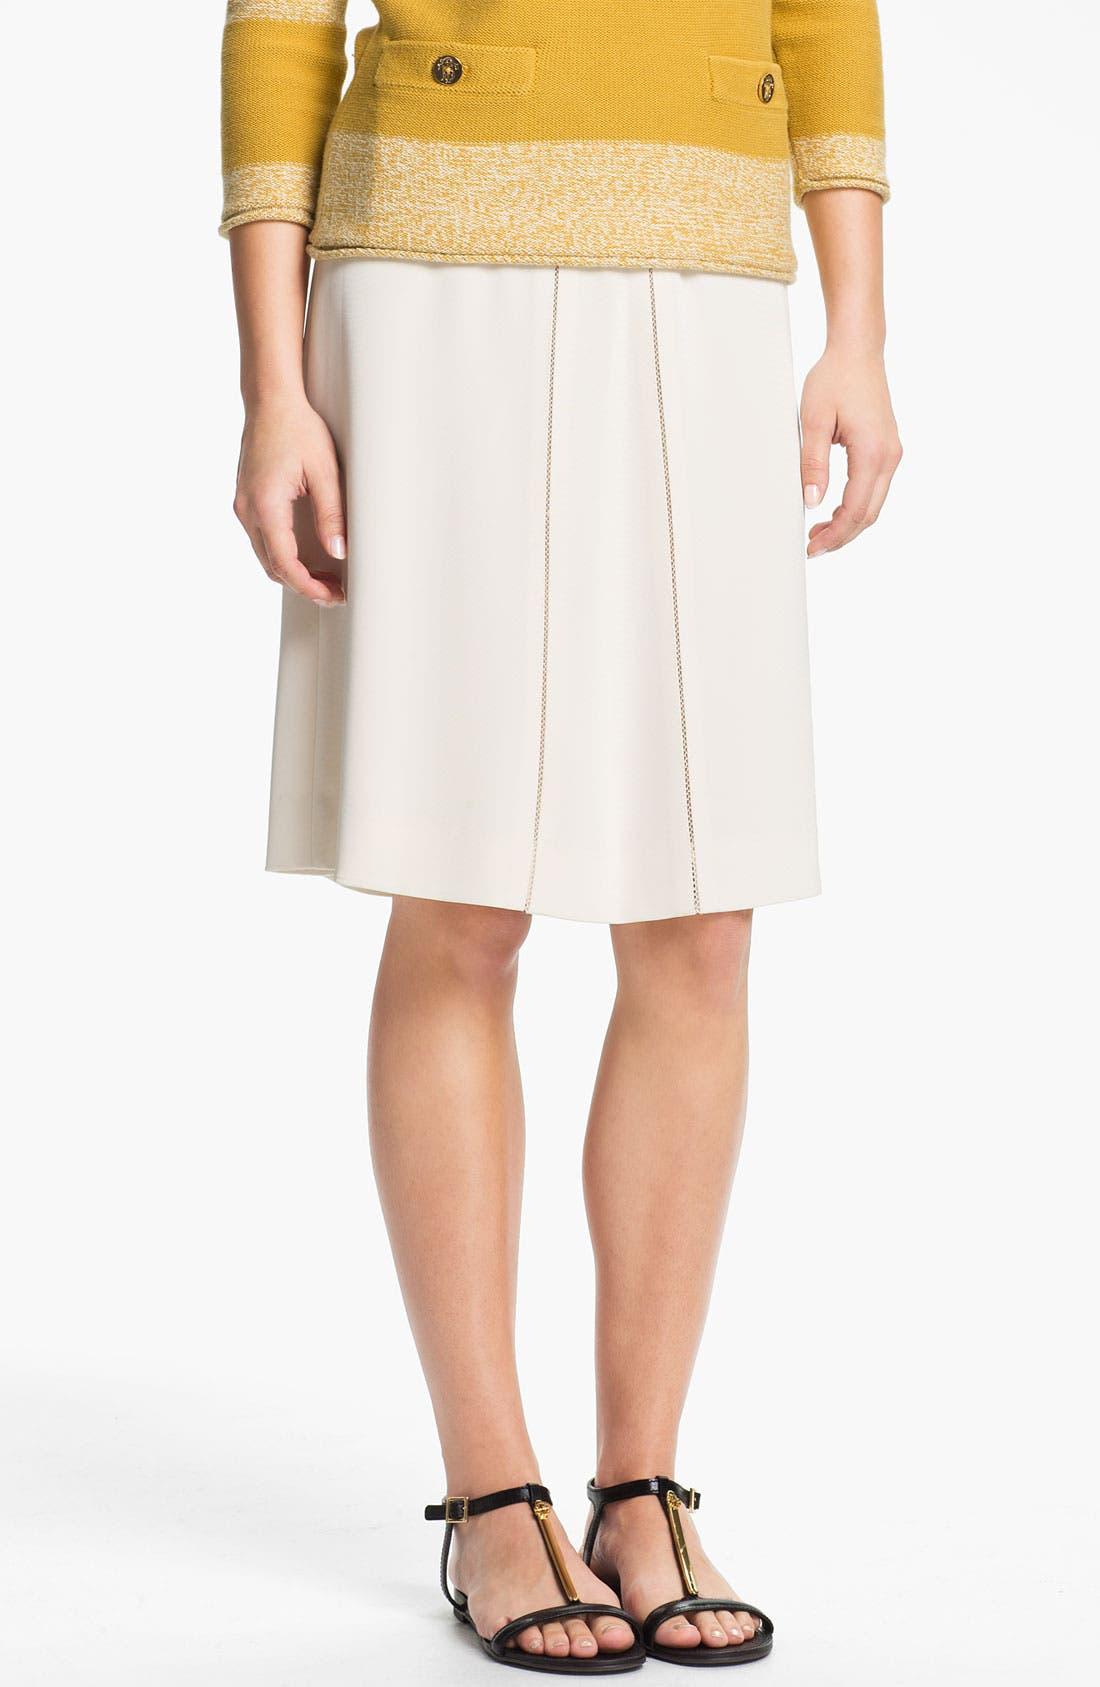 Alternate Image 1 Selected - Tory Burch 'Alton' Skirt